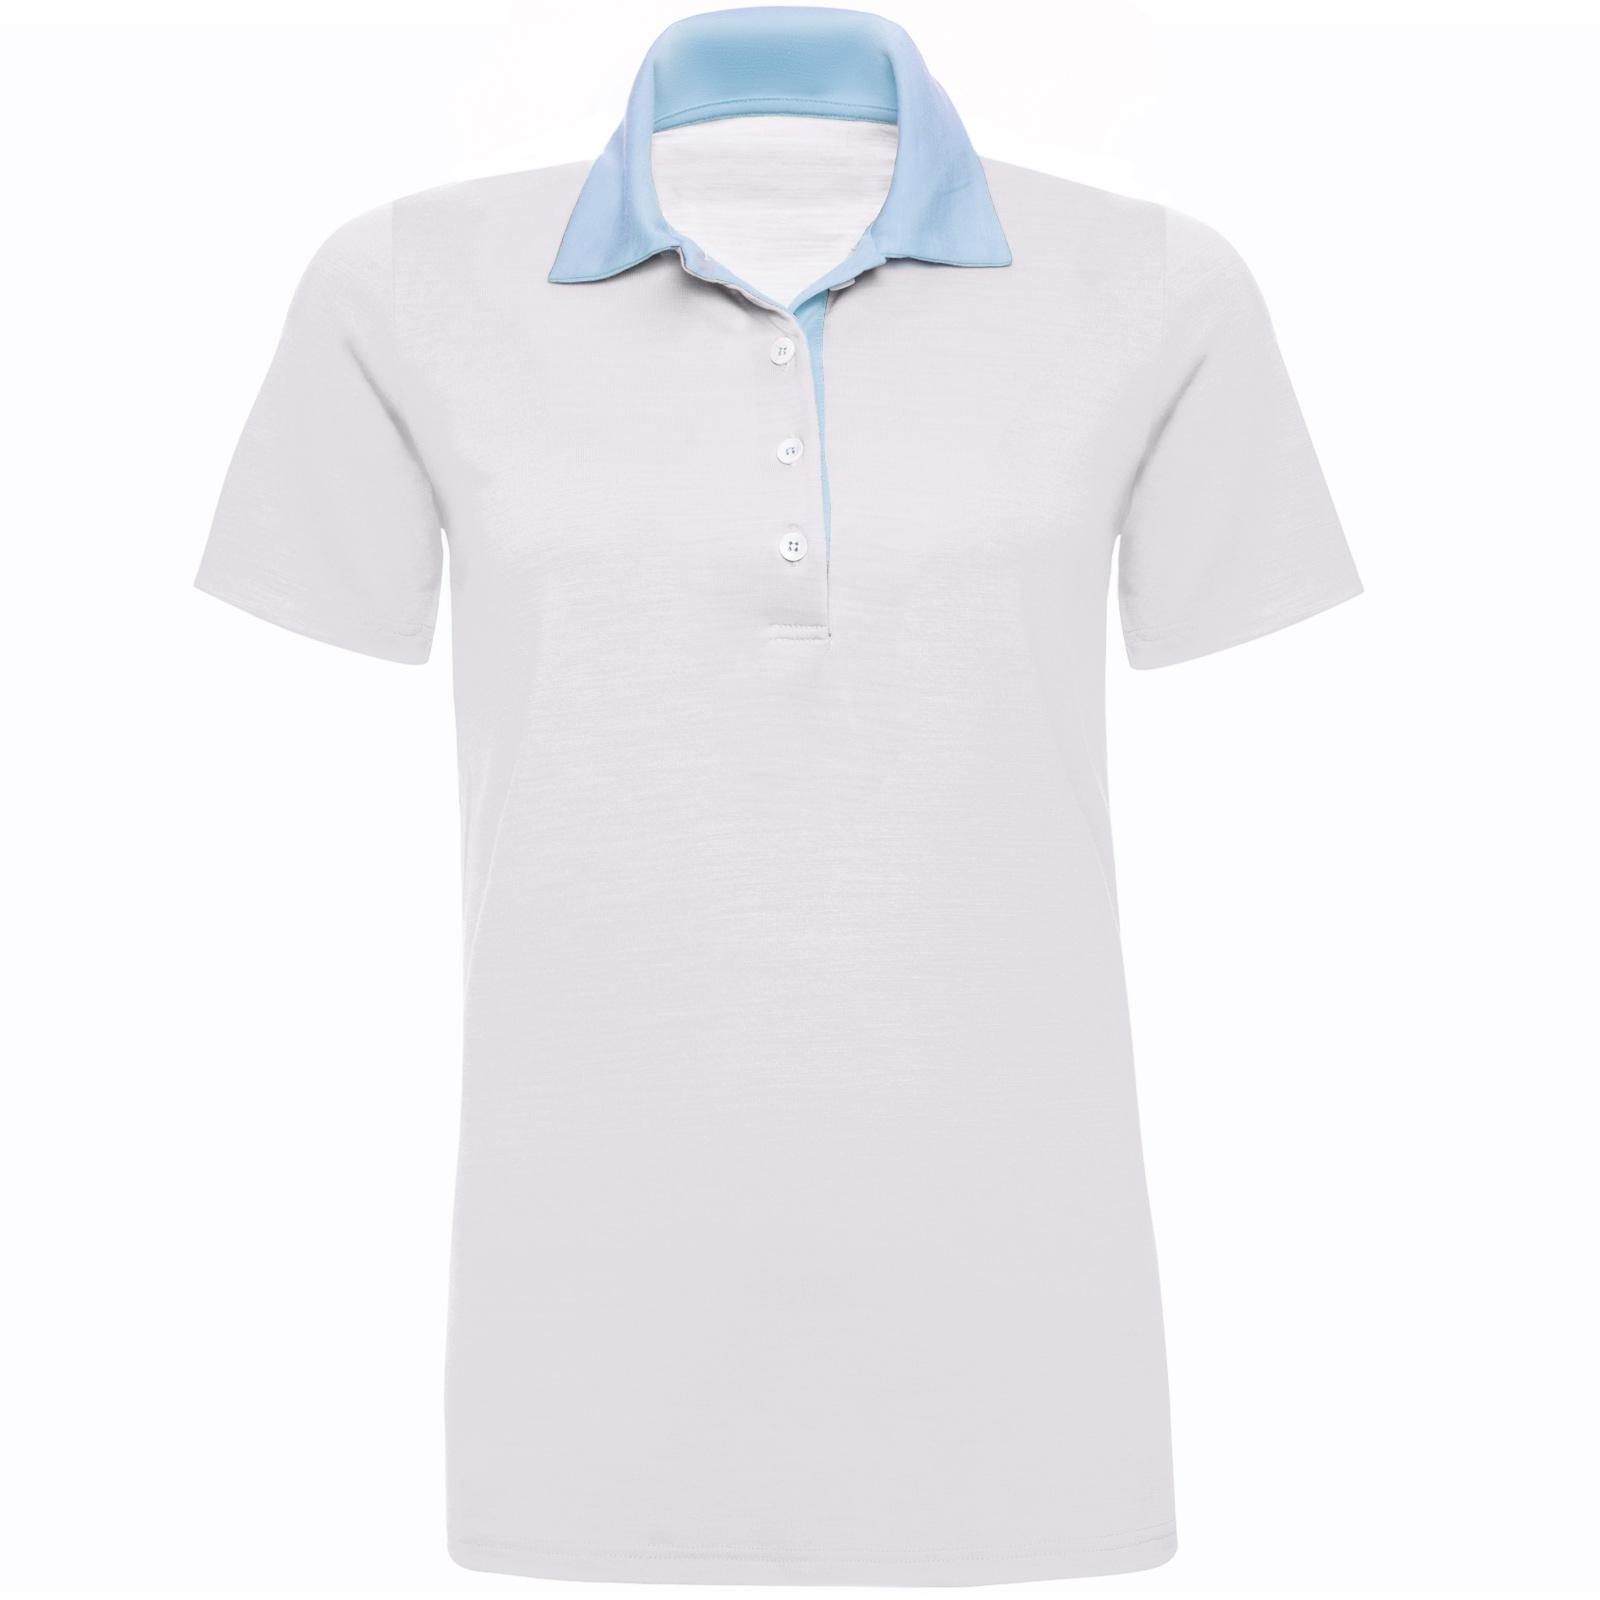 URBAN LIMITED Merino Poloshirt Damen Kurzarm Regular 200 Sand XS